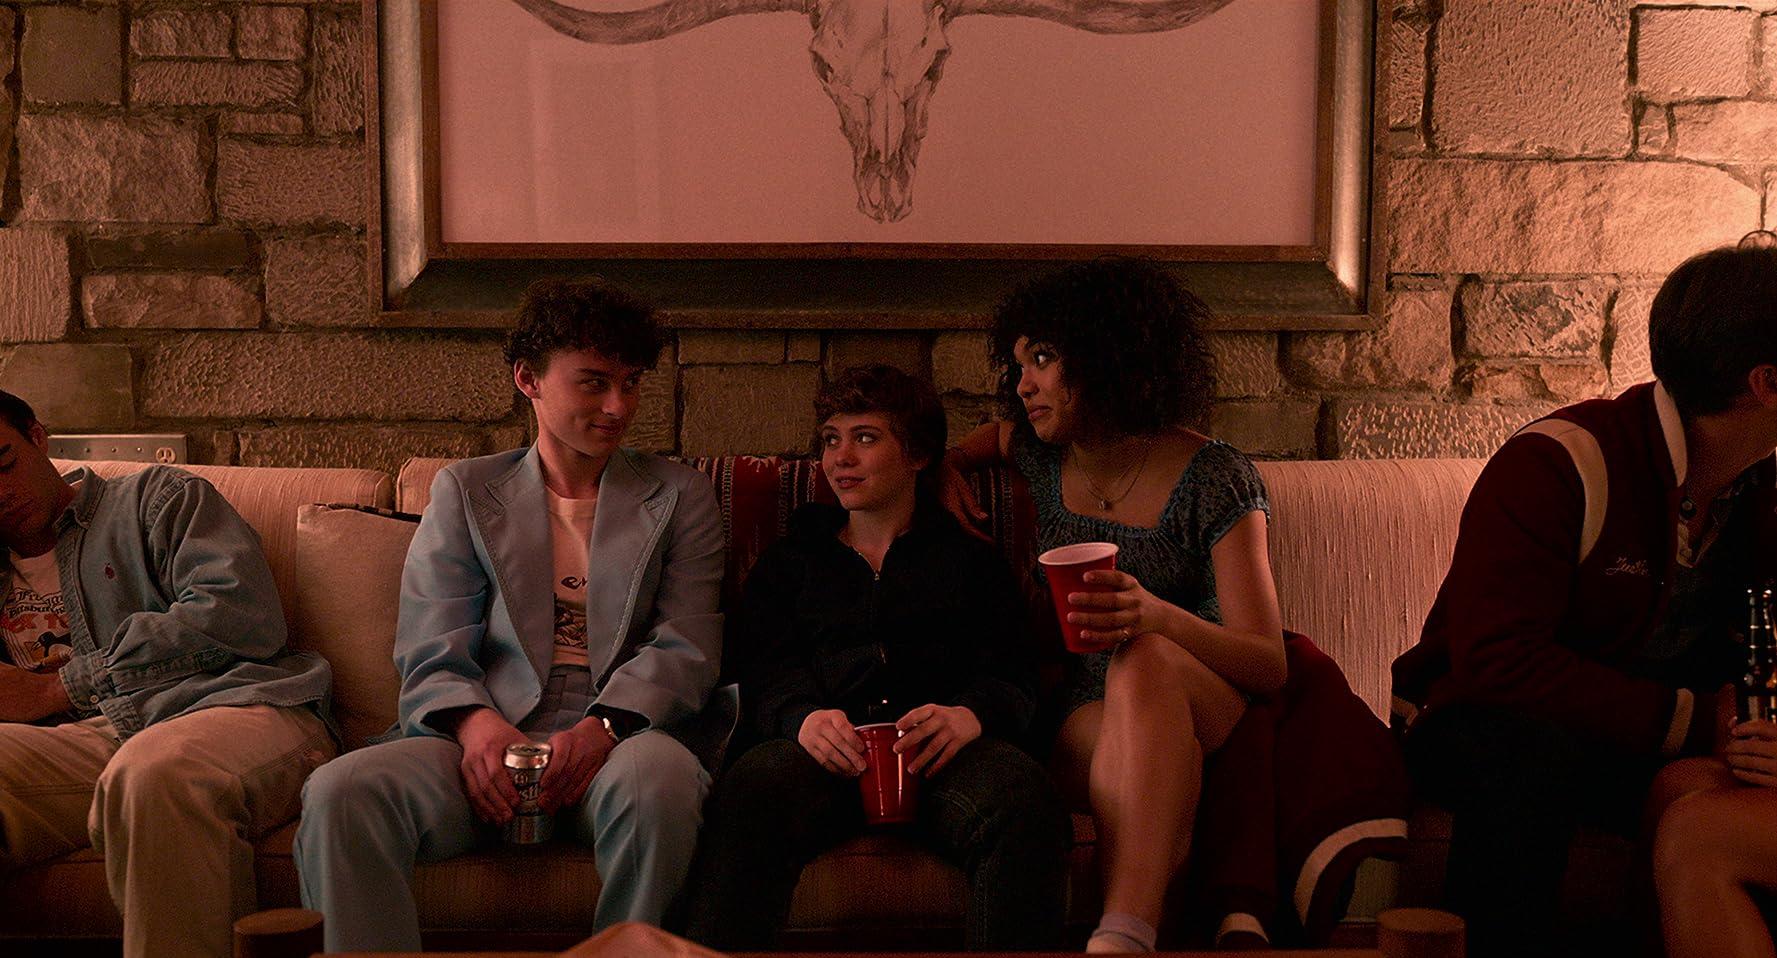 Wyatt Oleff, Sophia Lillis, and Sofia Bryant in Episode #1.3 (2020)